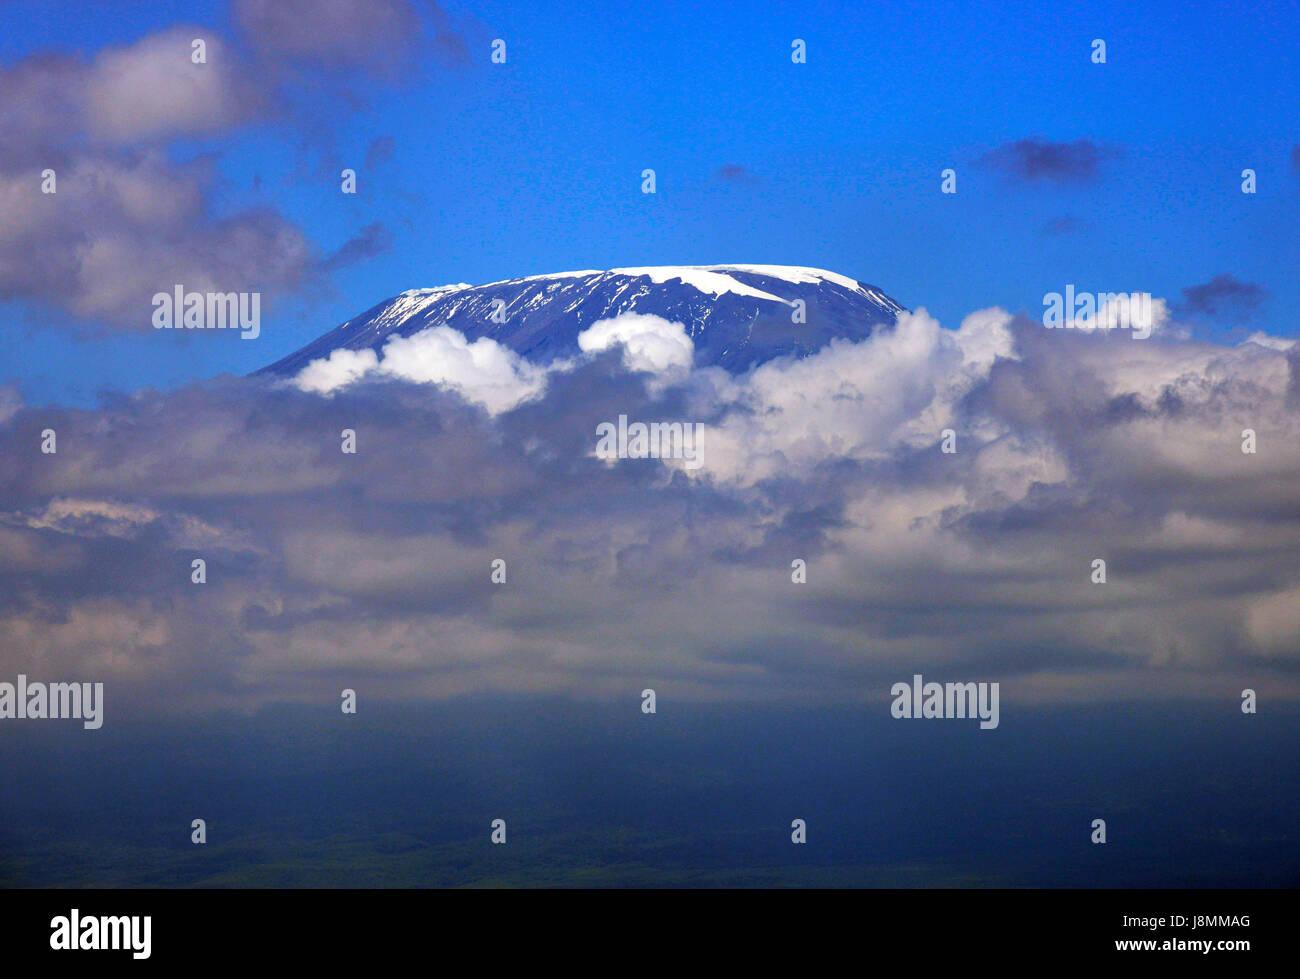 Mount Kilimanjaro peeking out of the clouds. - Stock Image